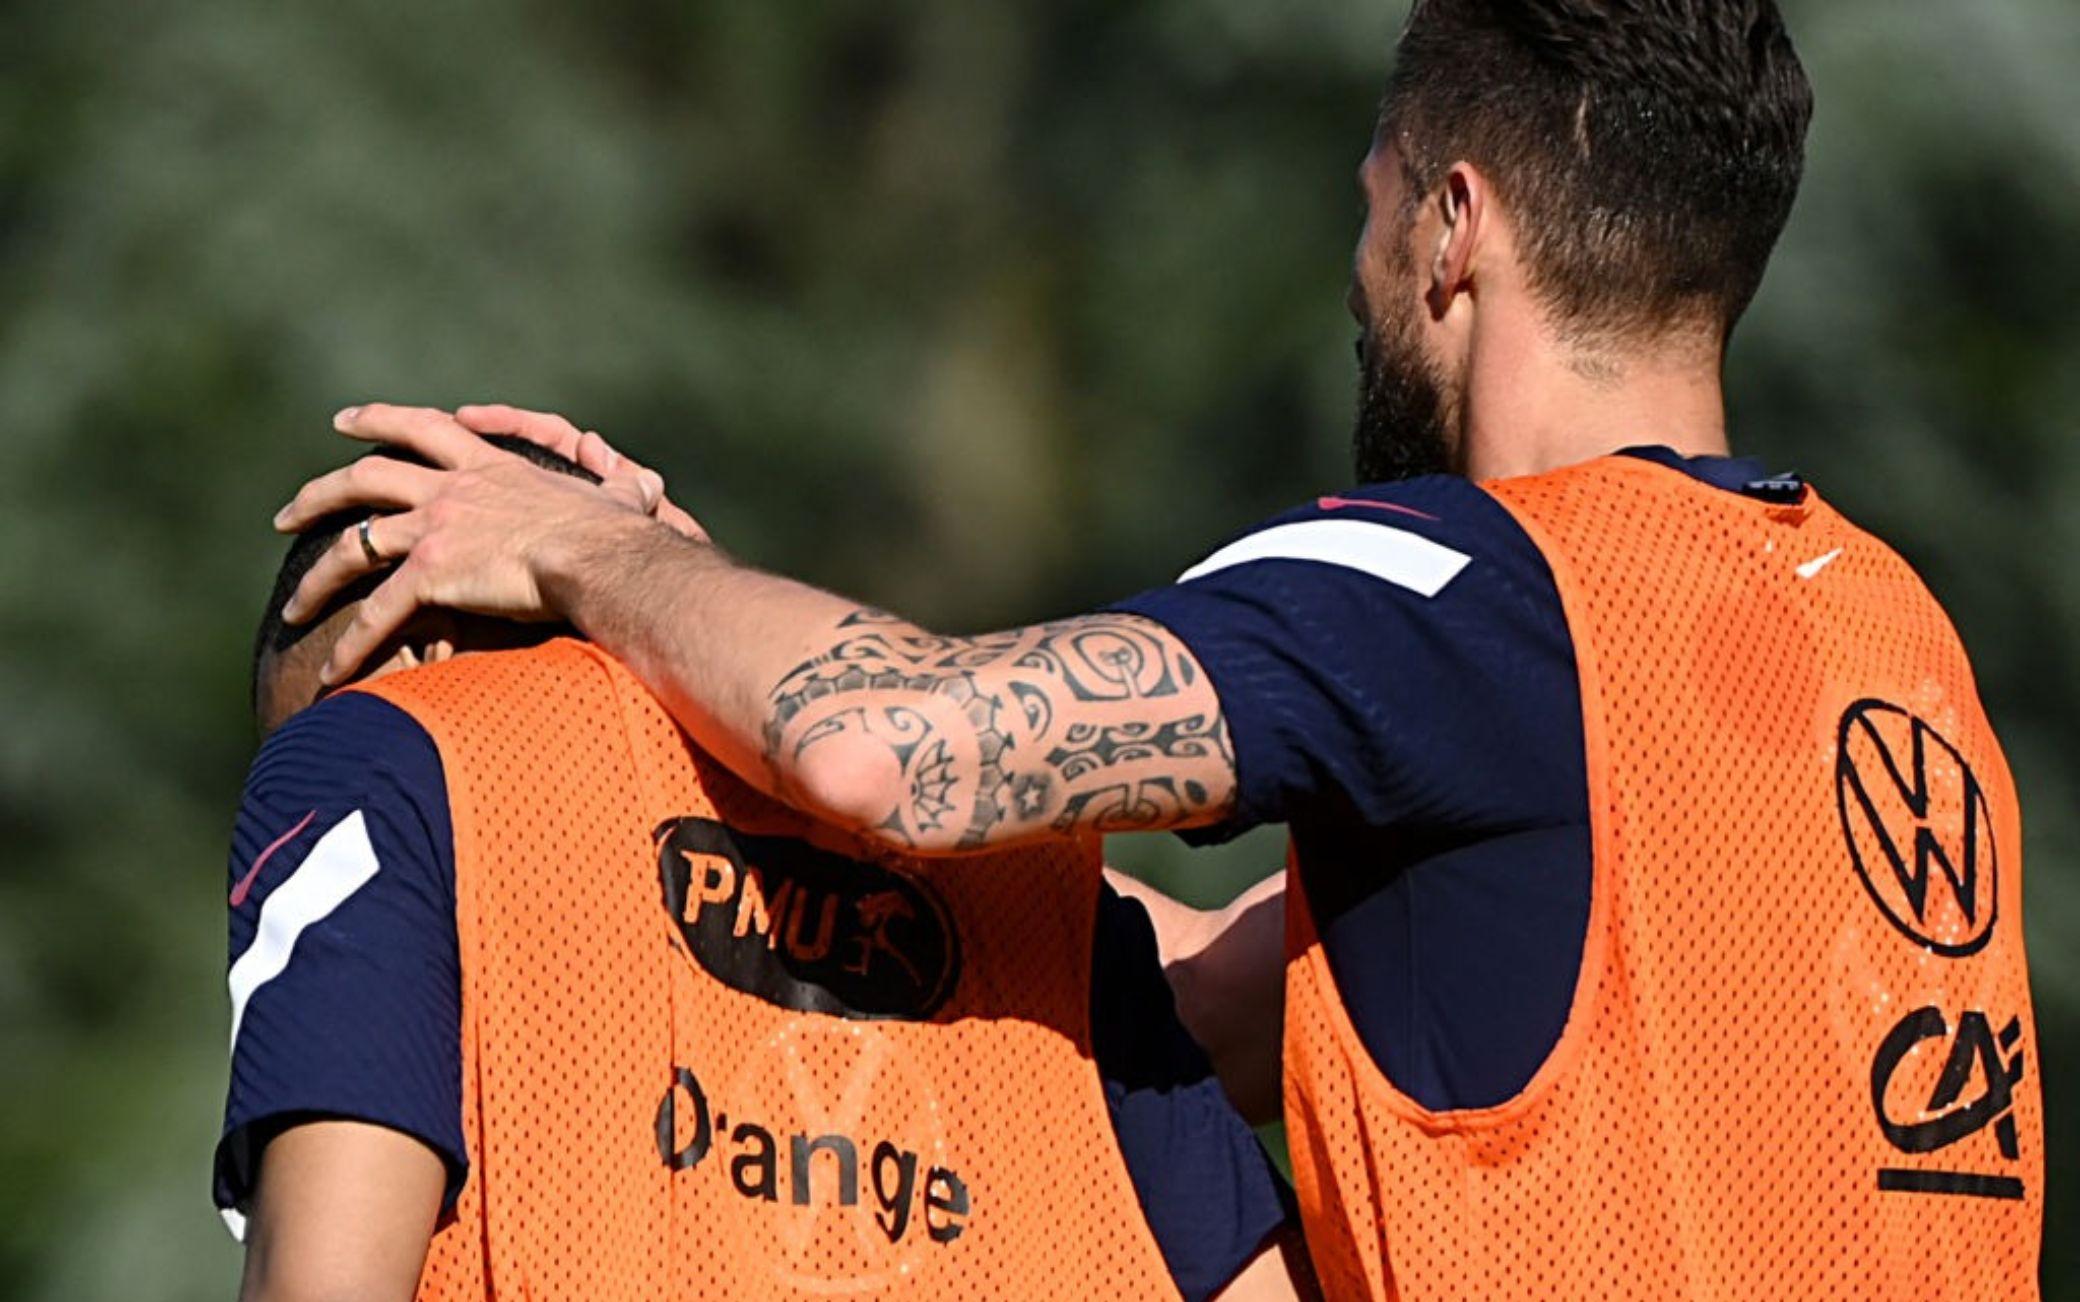 L'abbraccio Giroud-Mbappé in allenamento